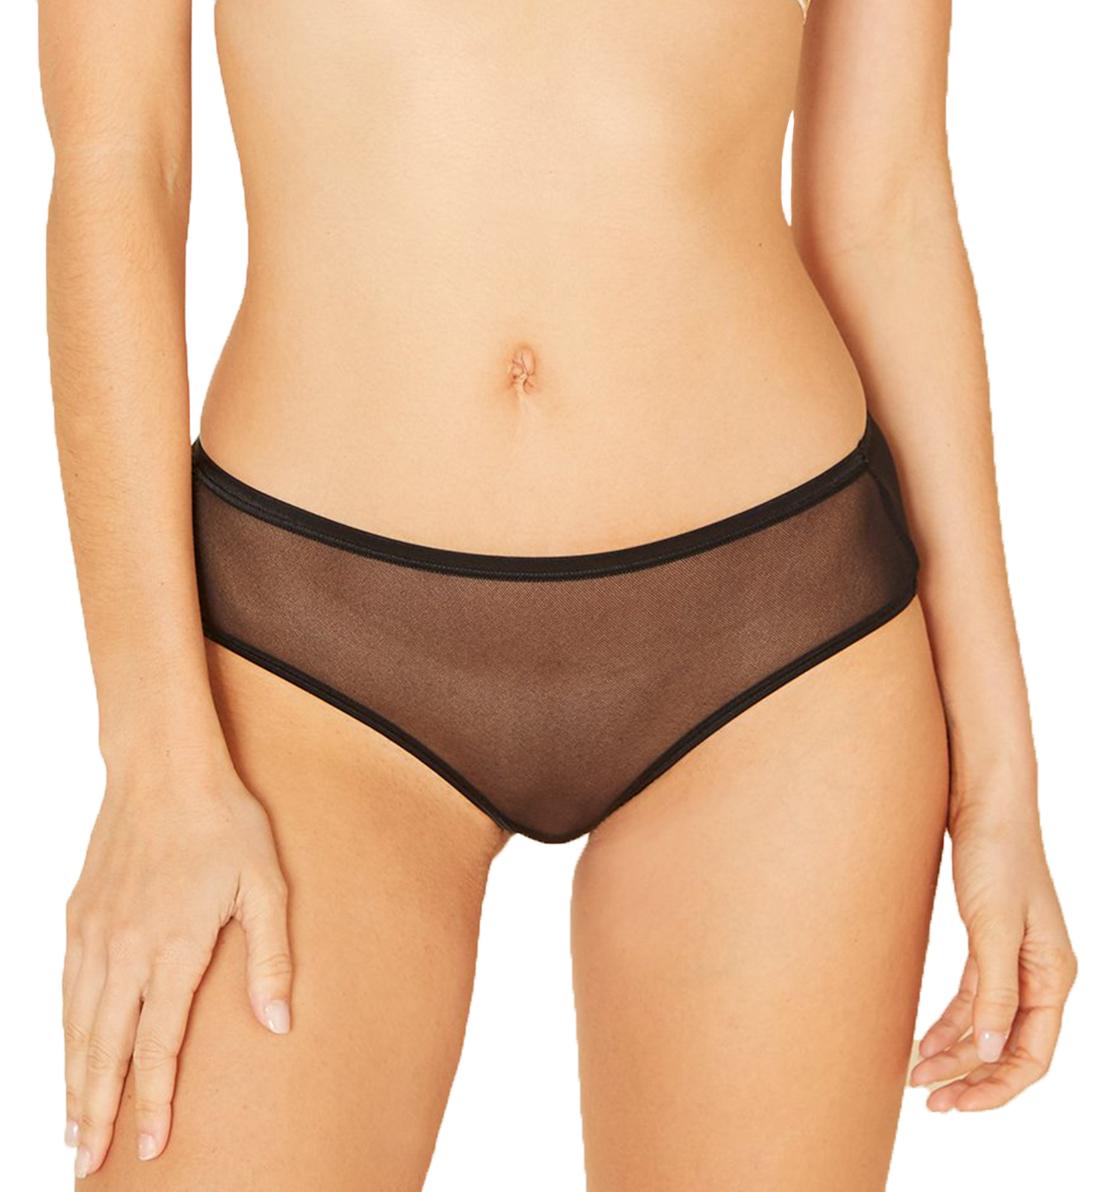 SOIRC0731 Details about  /Cosabella Soire Confidence Boyleg Panty